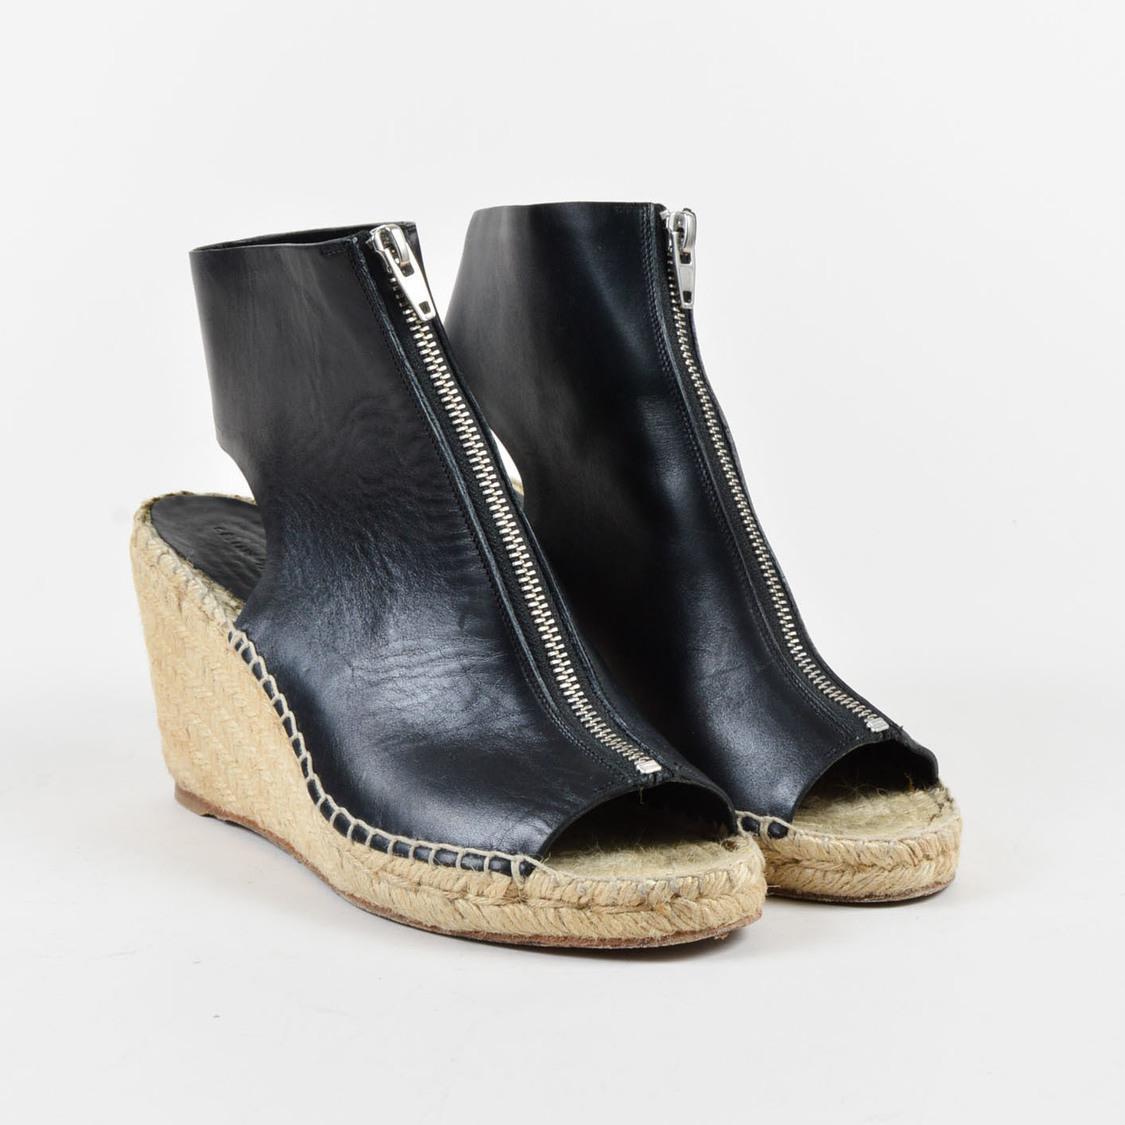 2b62c2061e3 Céline Black Leather Open Toe Zip Up Espadrille Wedges Sz 39 in ...